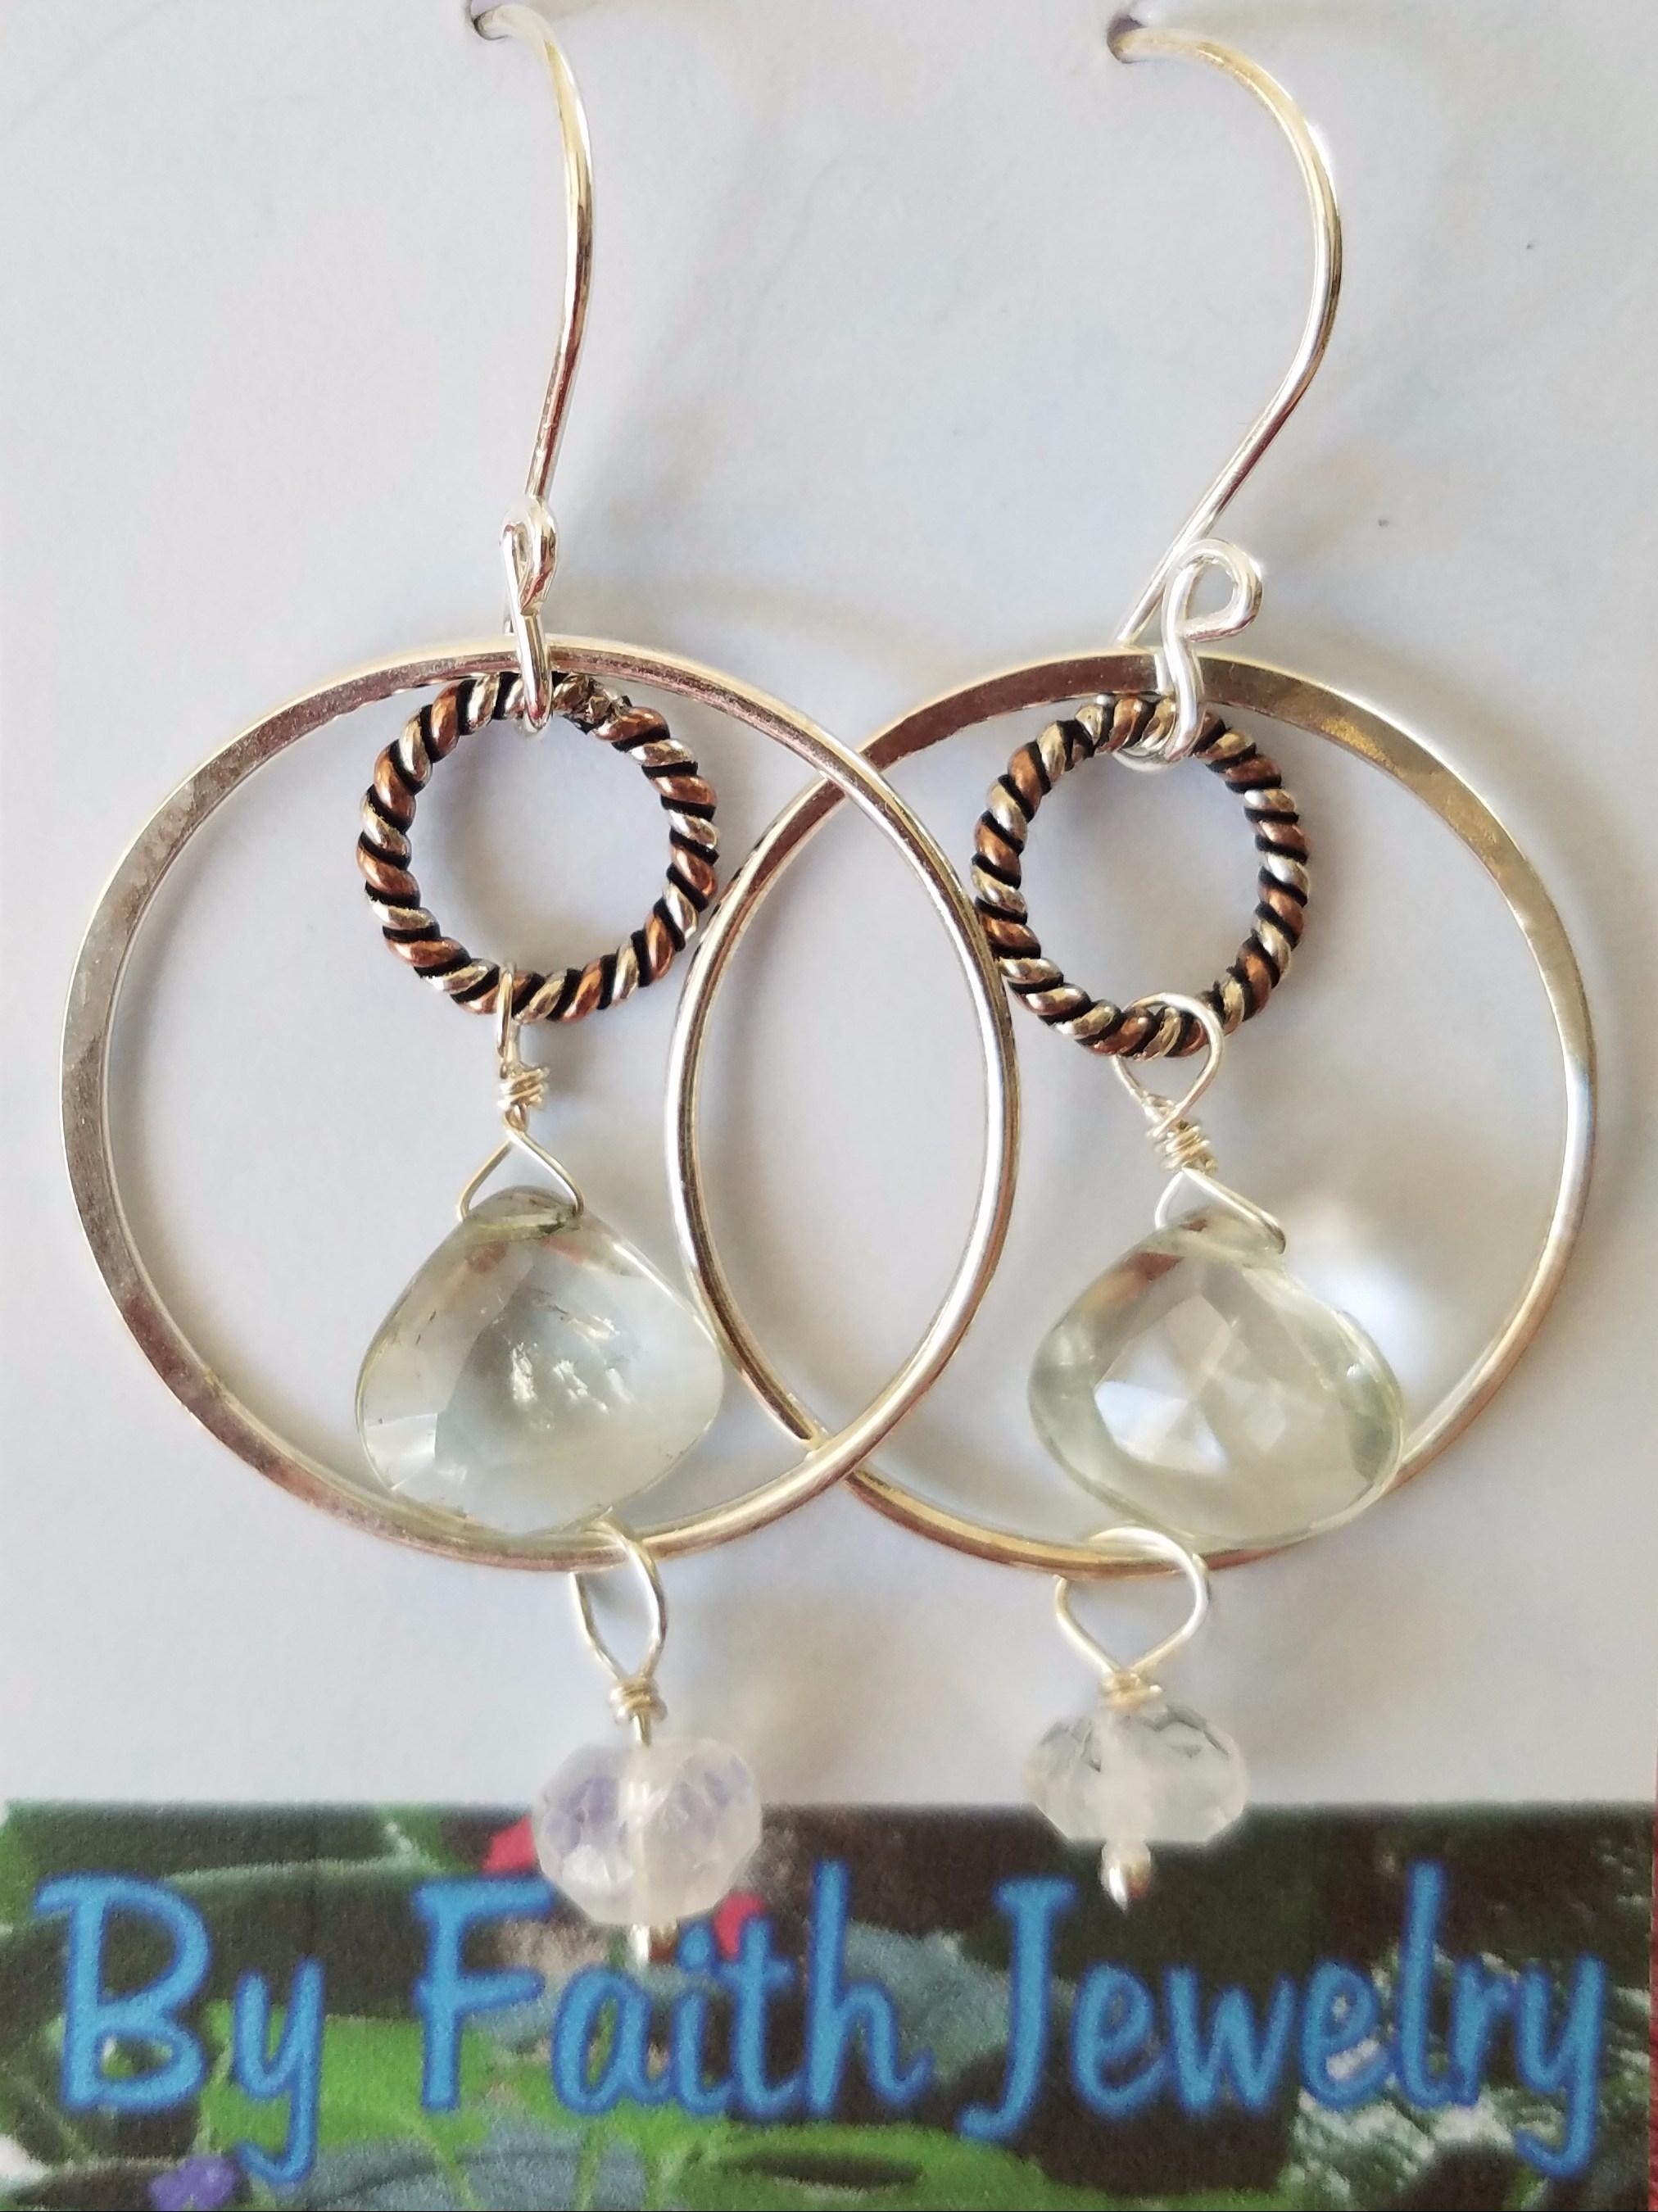 Green Amethyst & Moonstone earrings